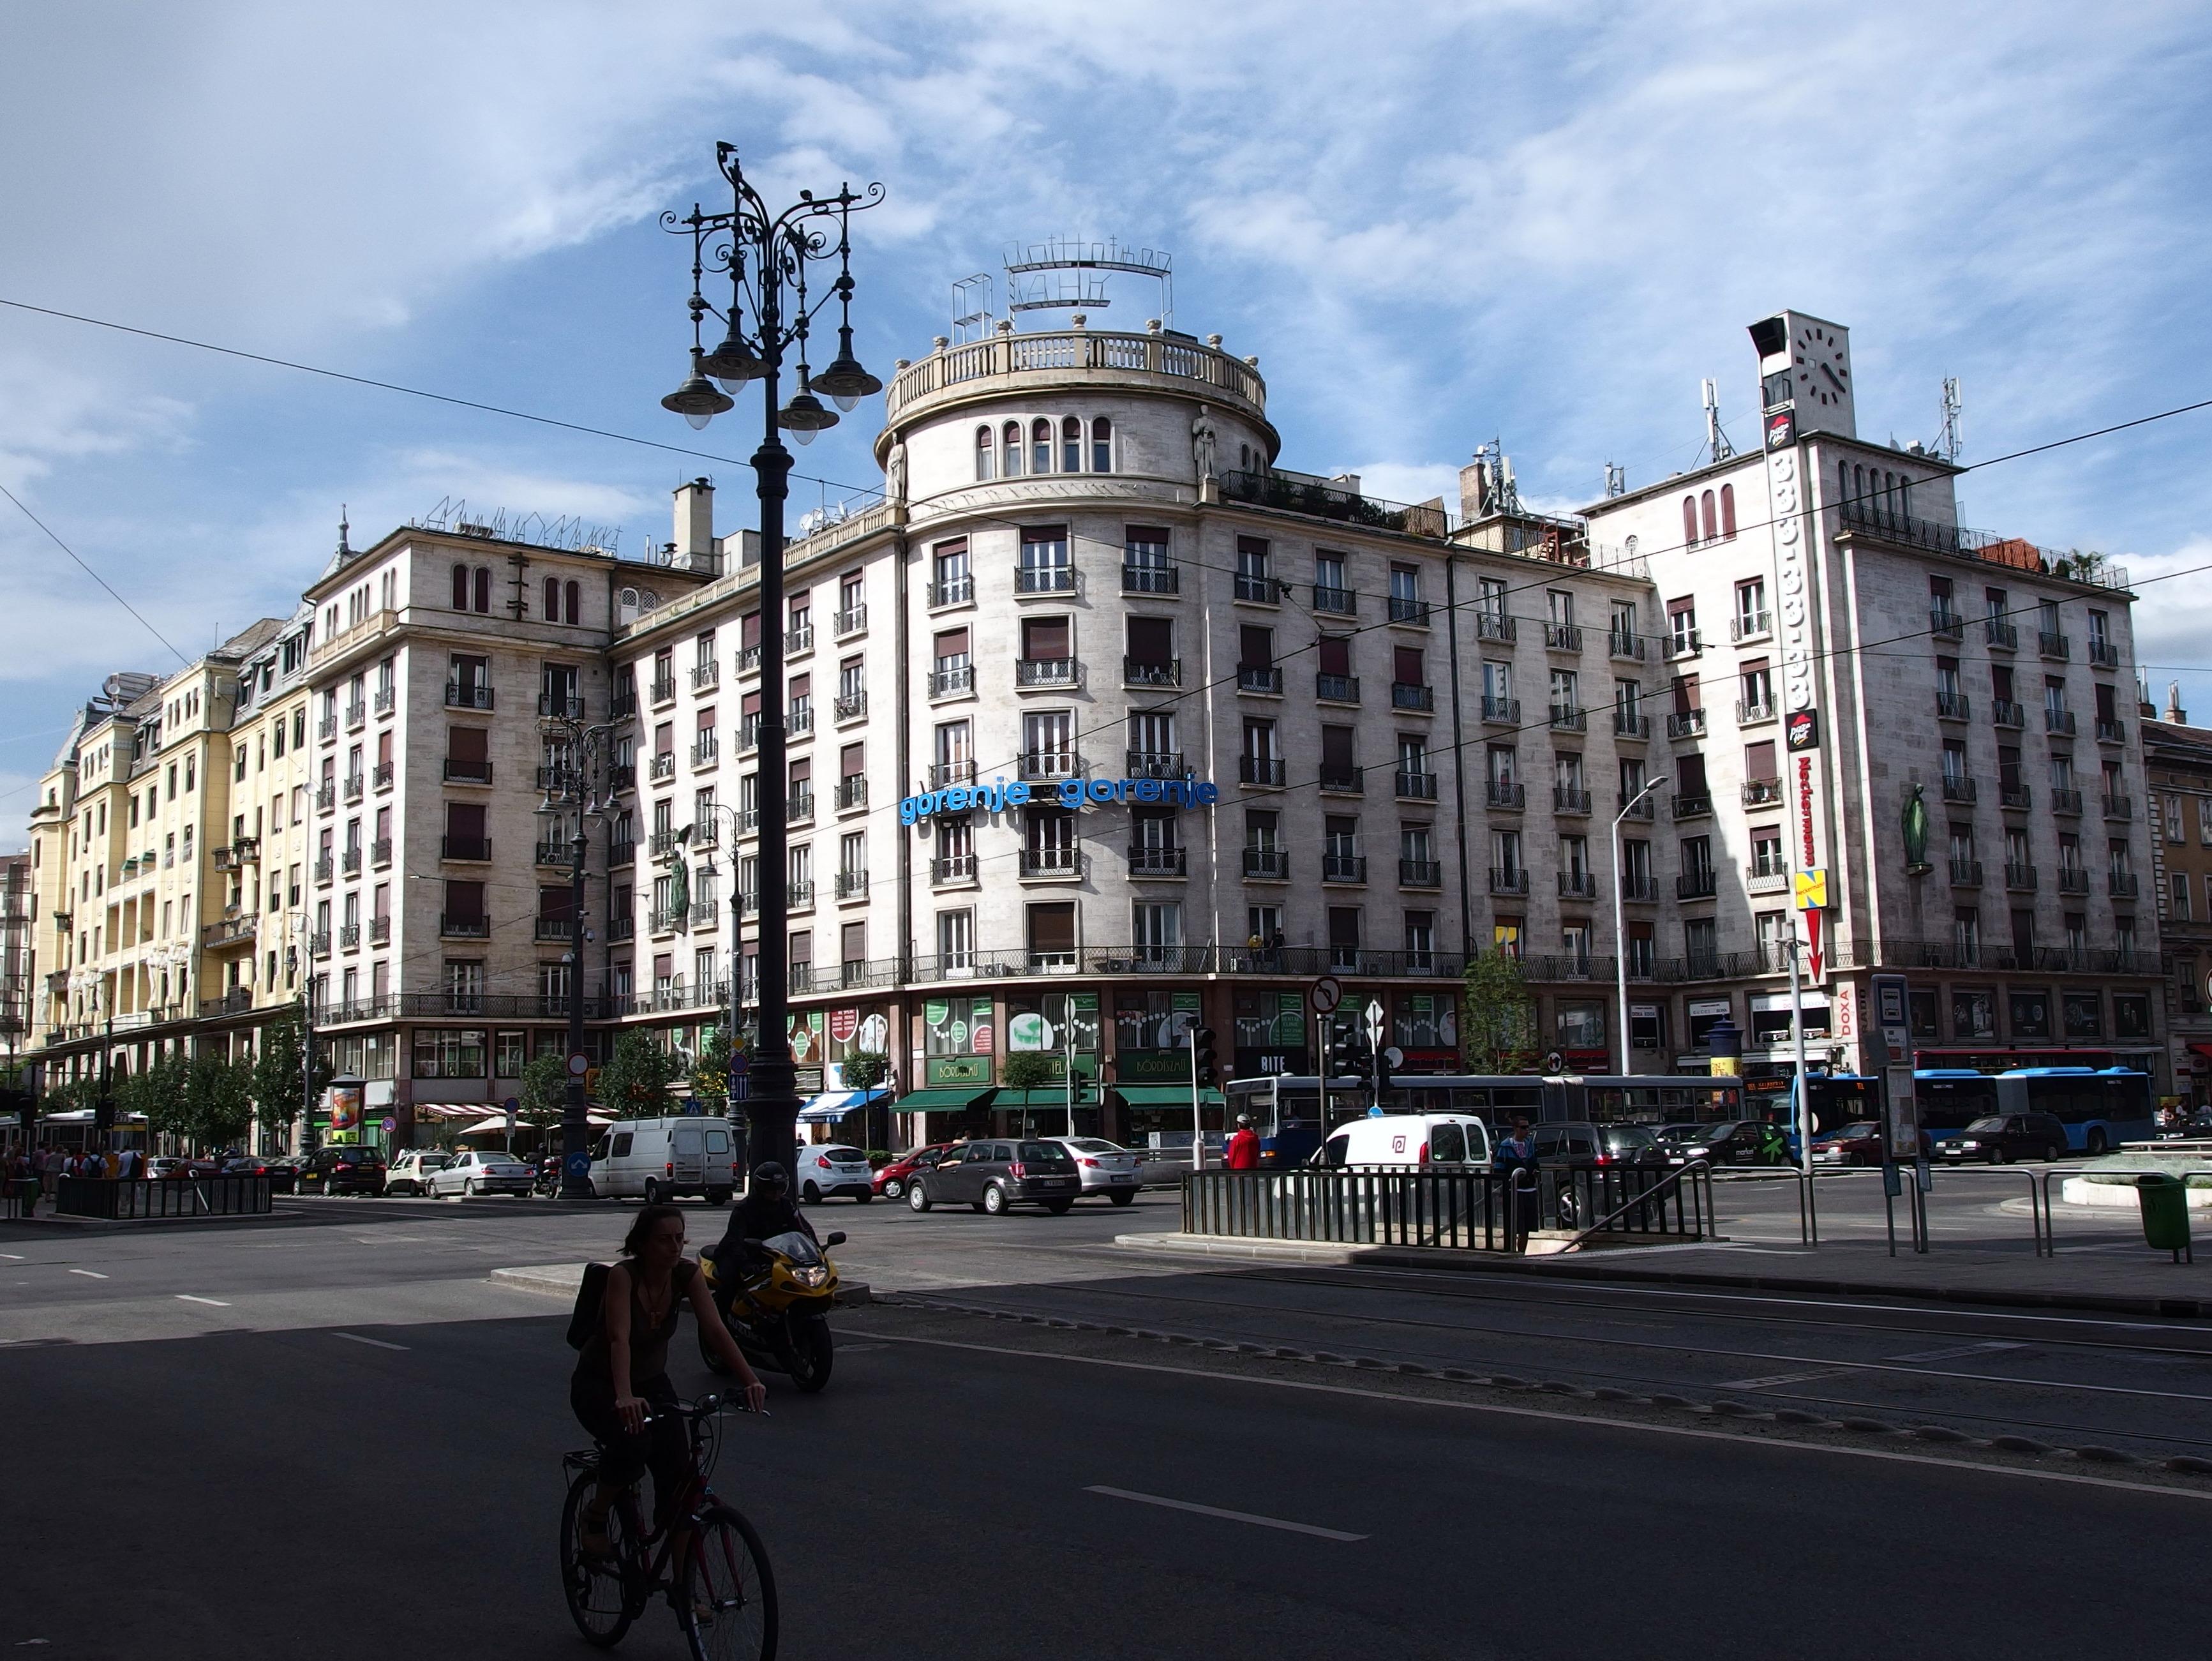 20130612_budapest_167_1.jpg